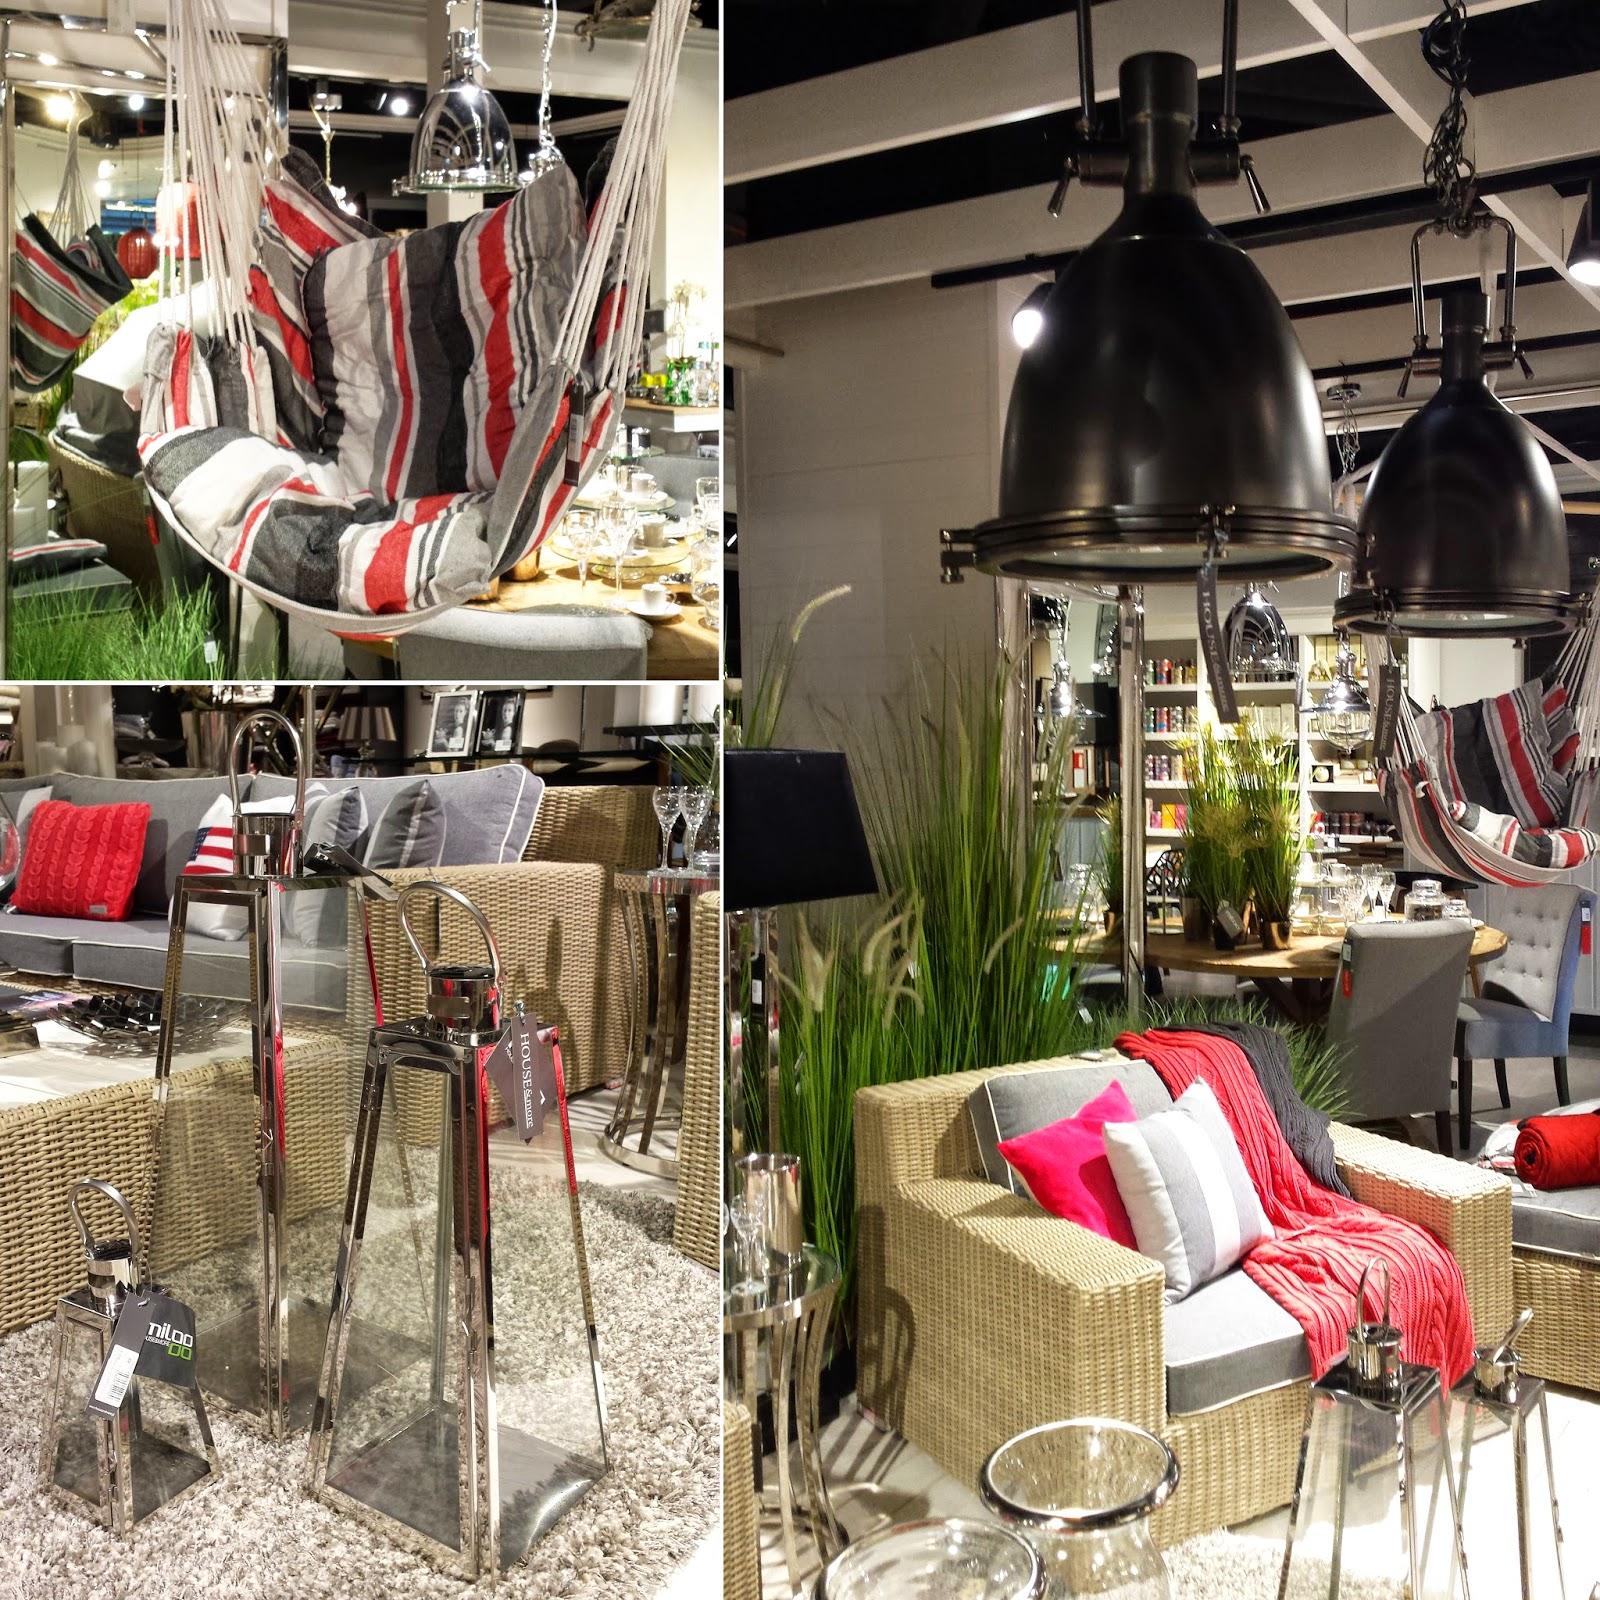 Dacon-Design-interiors-House&More-Miloo-Manutti-Eichholtz-Flamat-Pomax-Riviera Maison-Grand Design-meble skandynawskie-ogrodowe-wiszace fotele